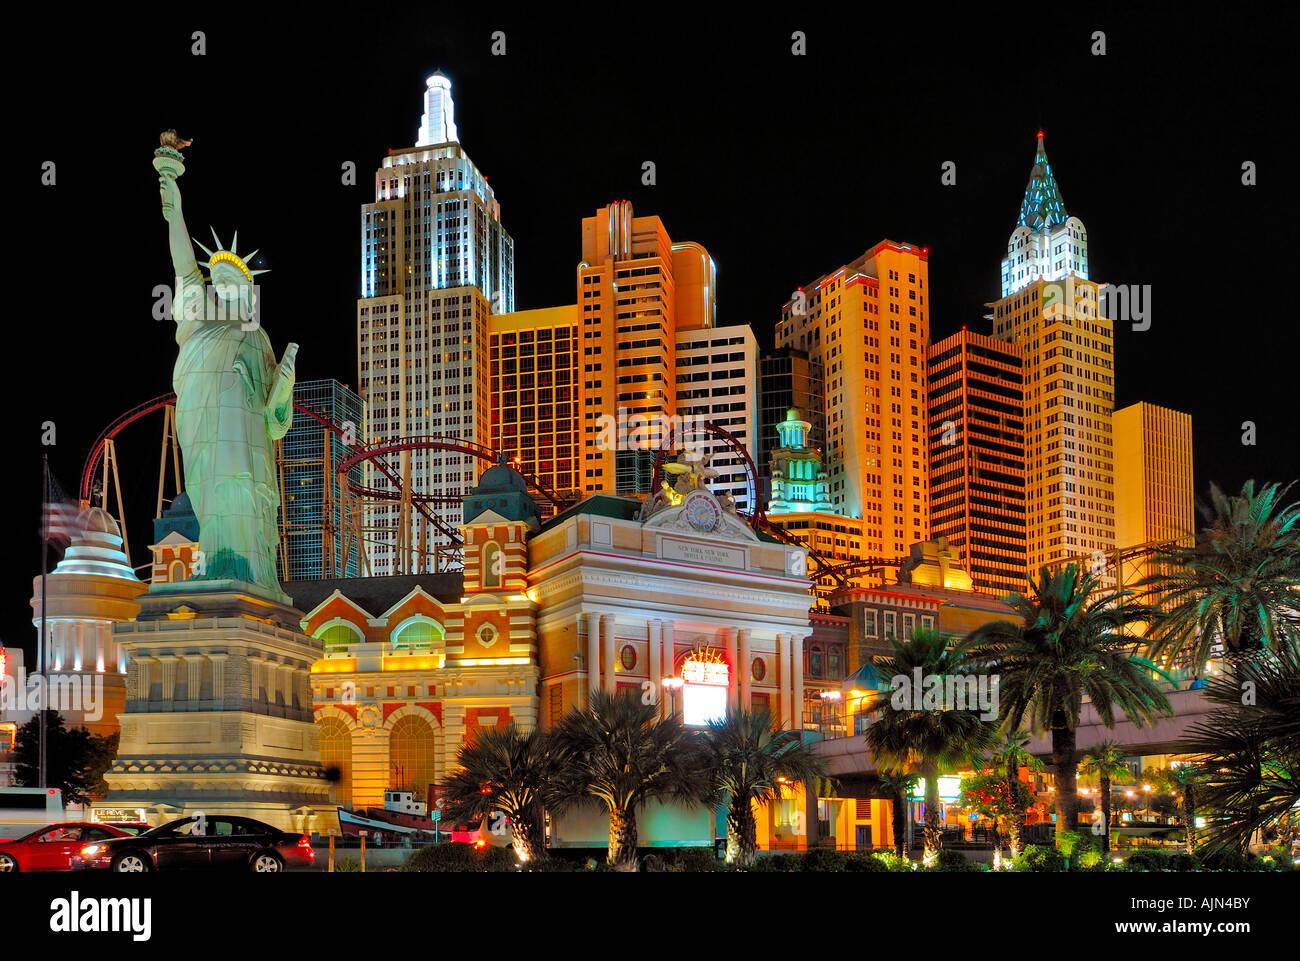 Statue Of Liberty At Night At New York New York Hotel Las Vegas